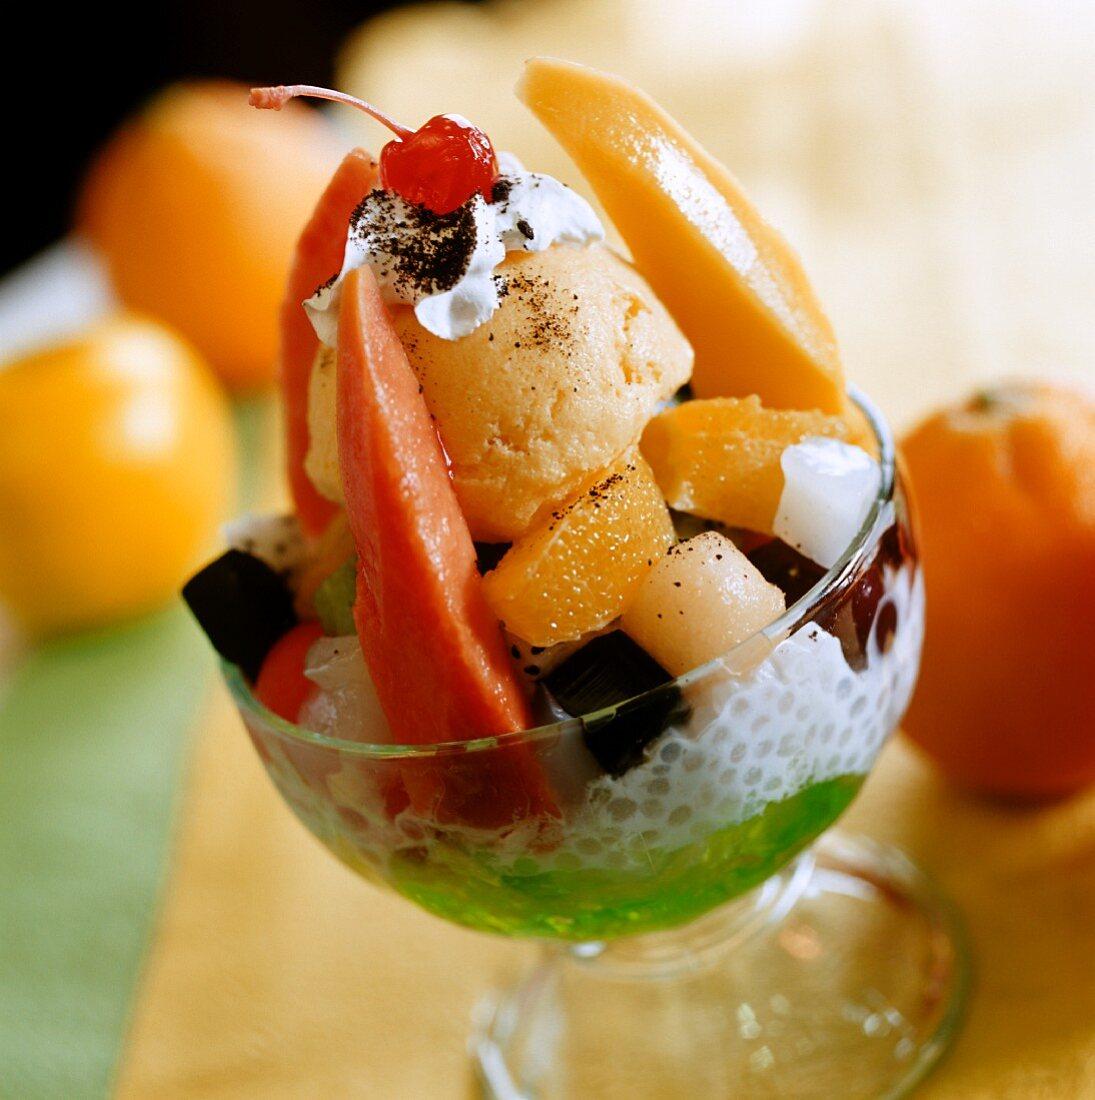 Ice cream sundae with fruit and sago cream (China)